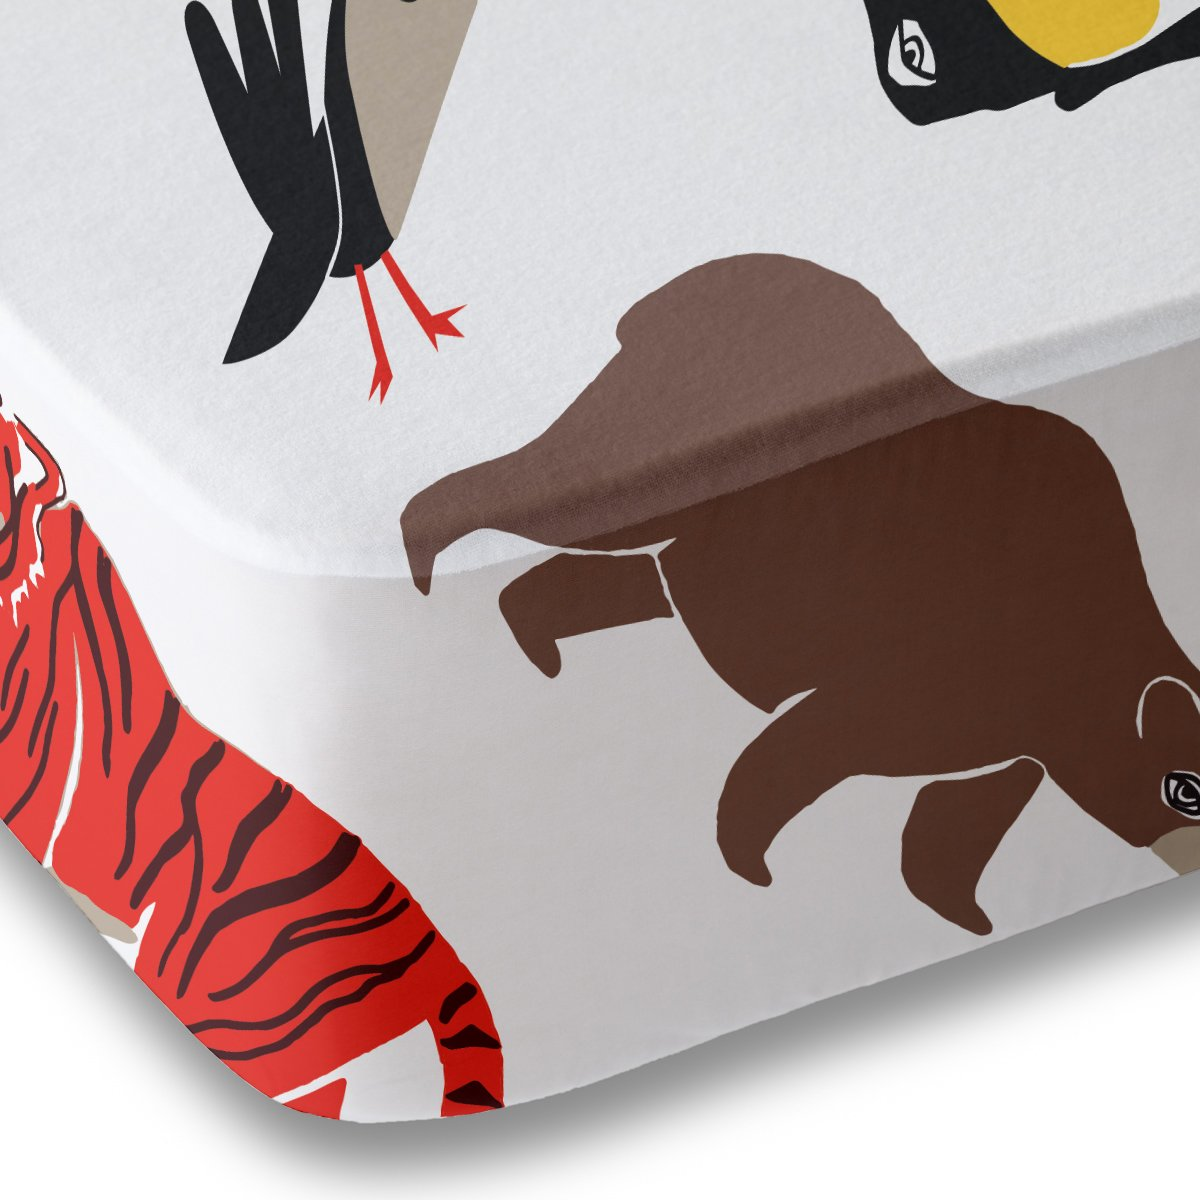 Animal Print Crib Sheet for Boys and Girls - Double Brushed Ultra Microfiber Luxury Crib Sheet Set By Where The Polka Dots Roam. Fits a Standard 52 mattress.